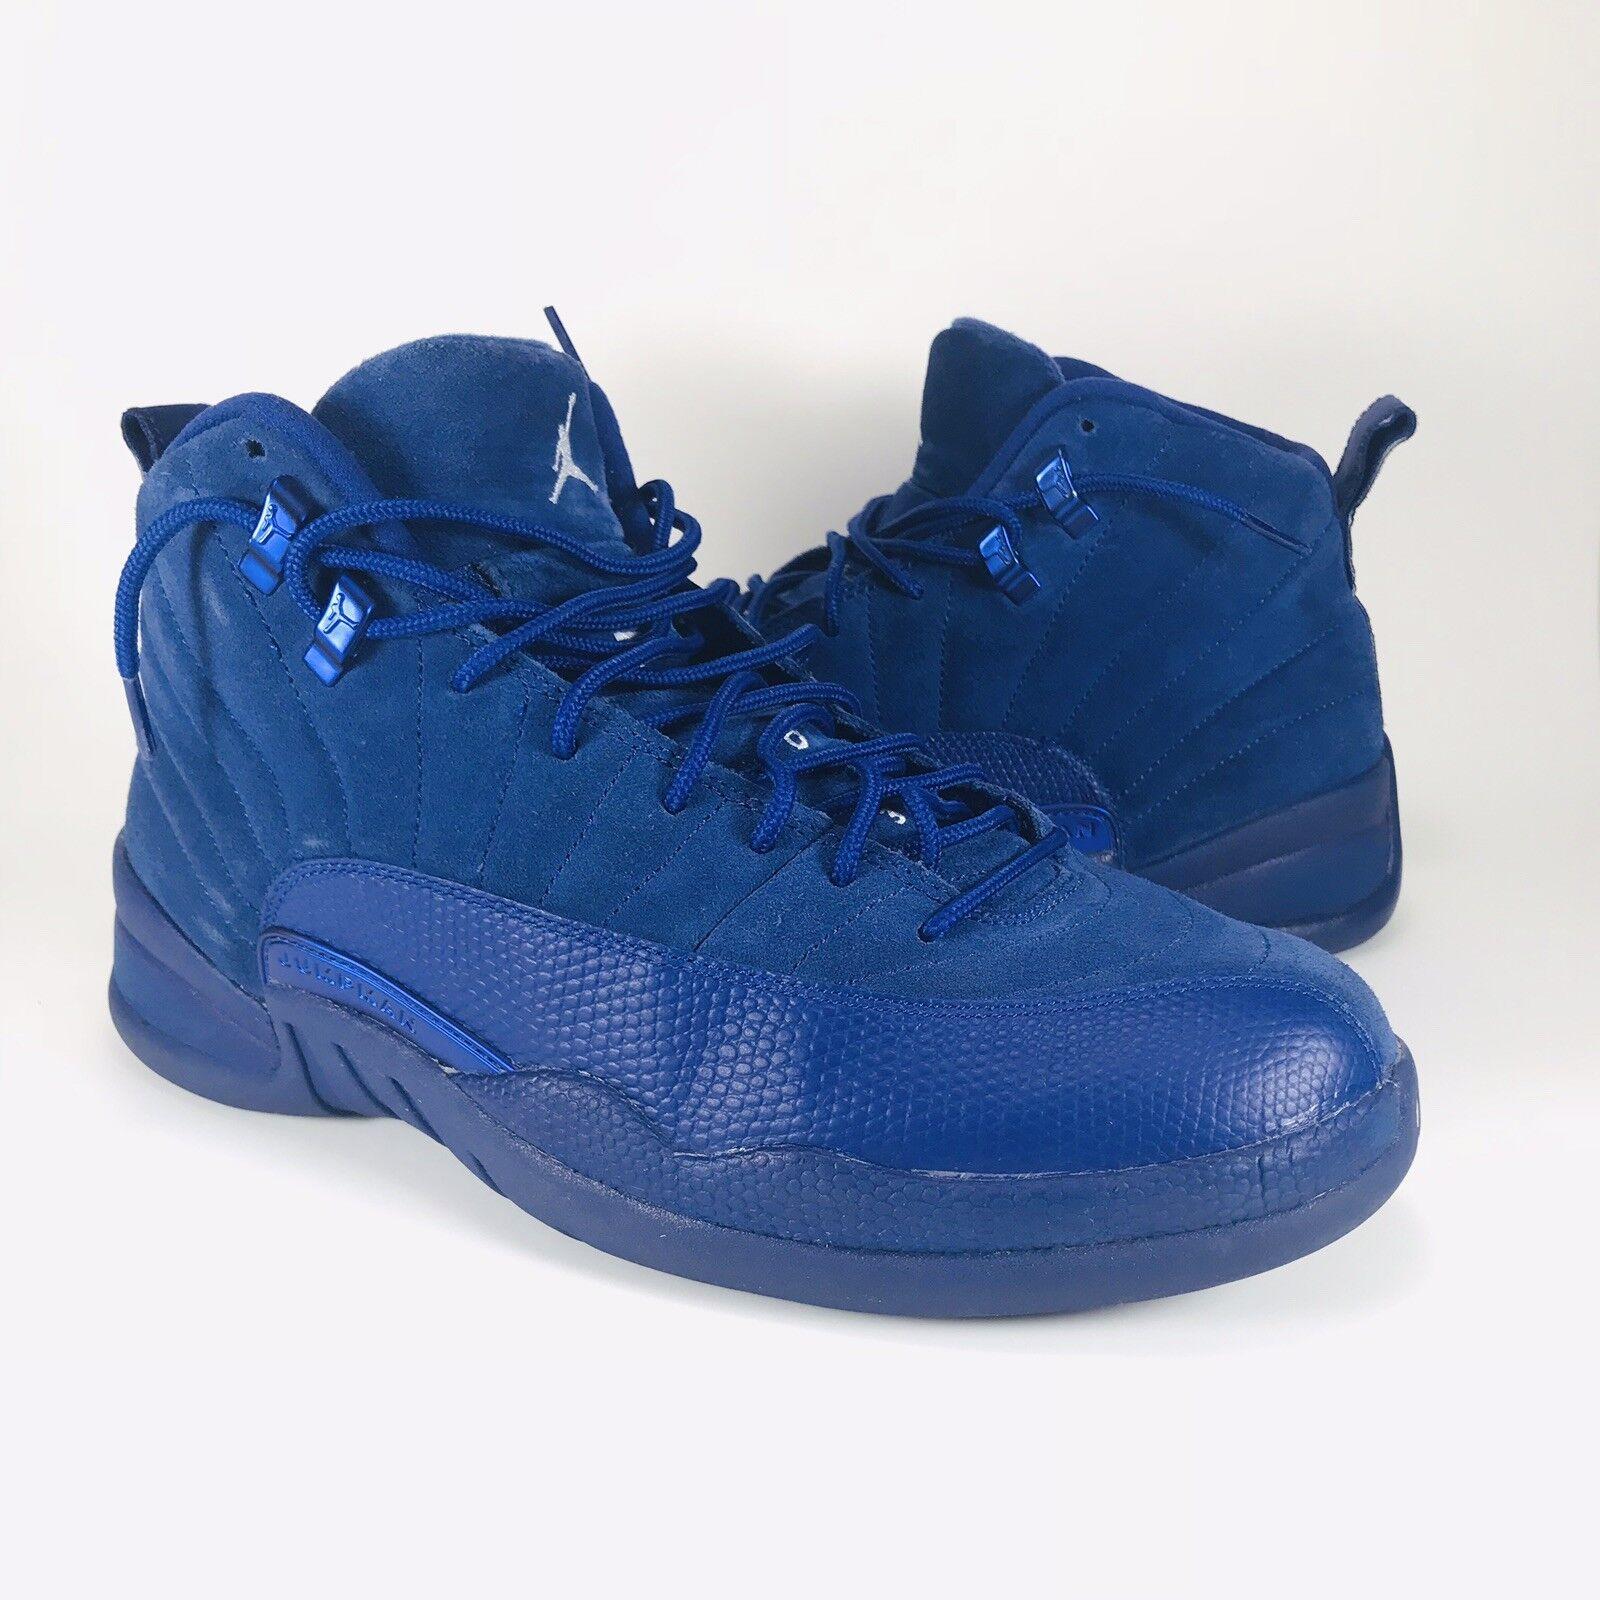 pretty nice caa61 558e3 Nike Air Jordan XII 12 Retro Deep Royal Blue Suede 130690-400 Sz 10 VNDS  Taxi